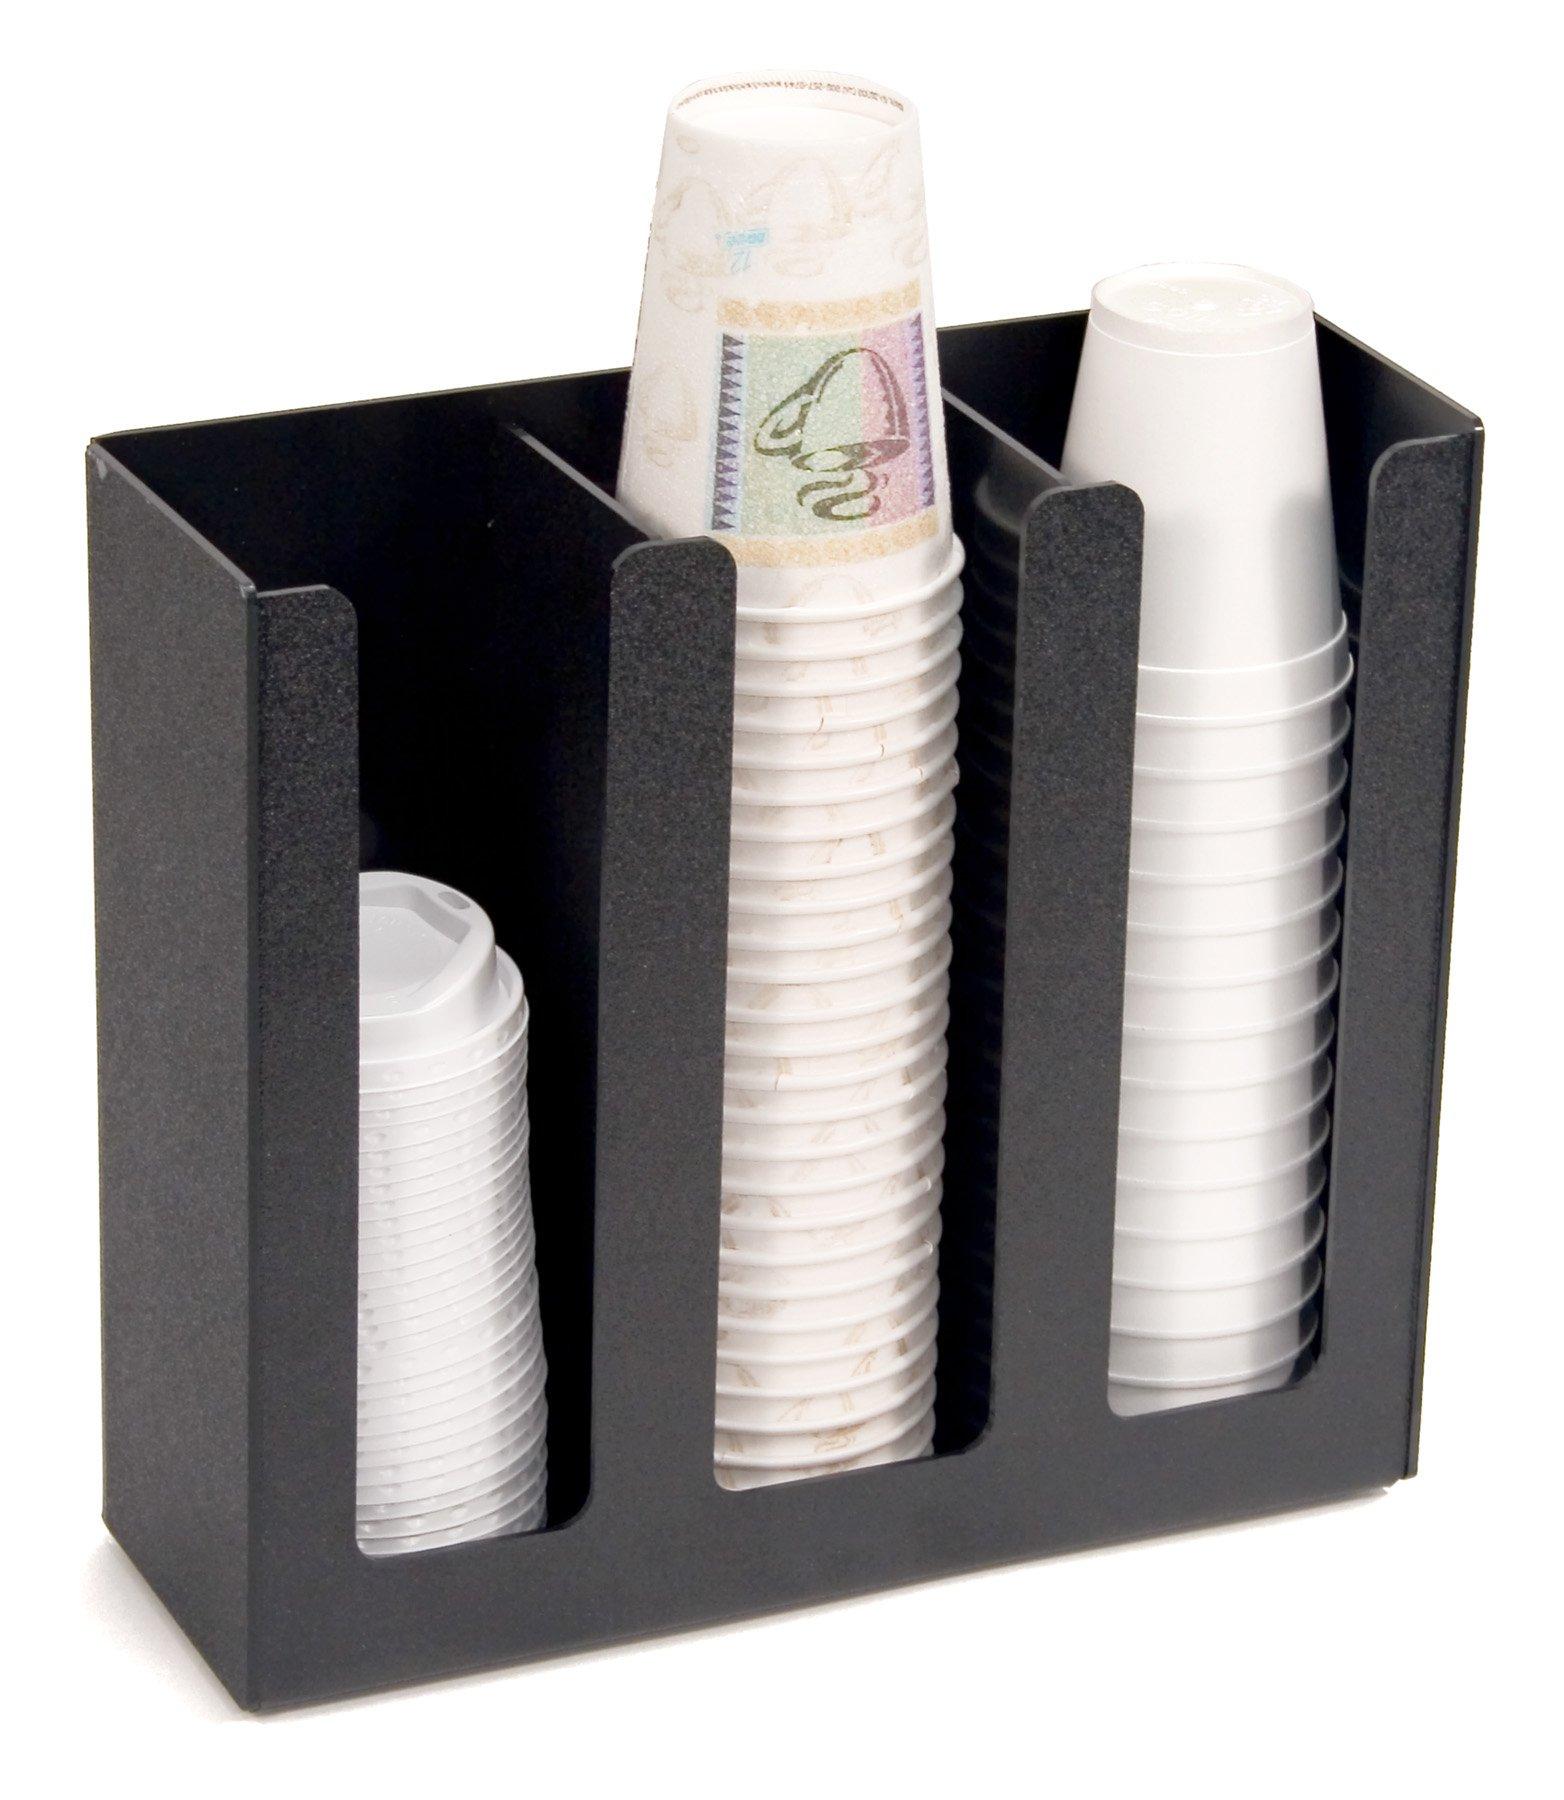 Vertiflex 3-Column Cup and Lid Holder, 12.75 x 4.5 x 11.75 Inches, Black (VFPC-1000) by Vertiflex